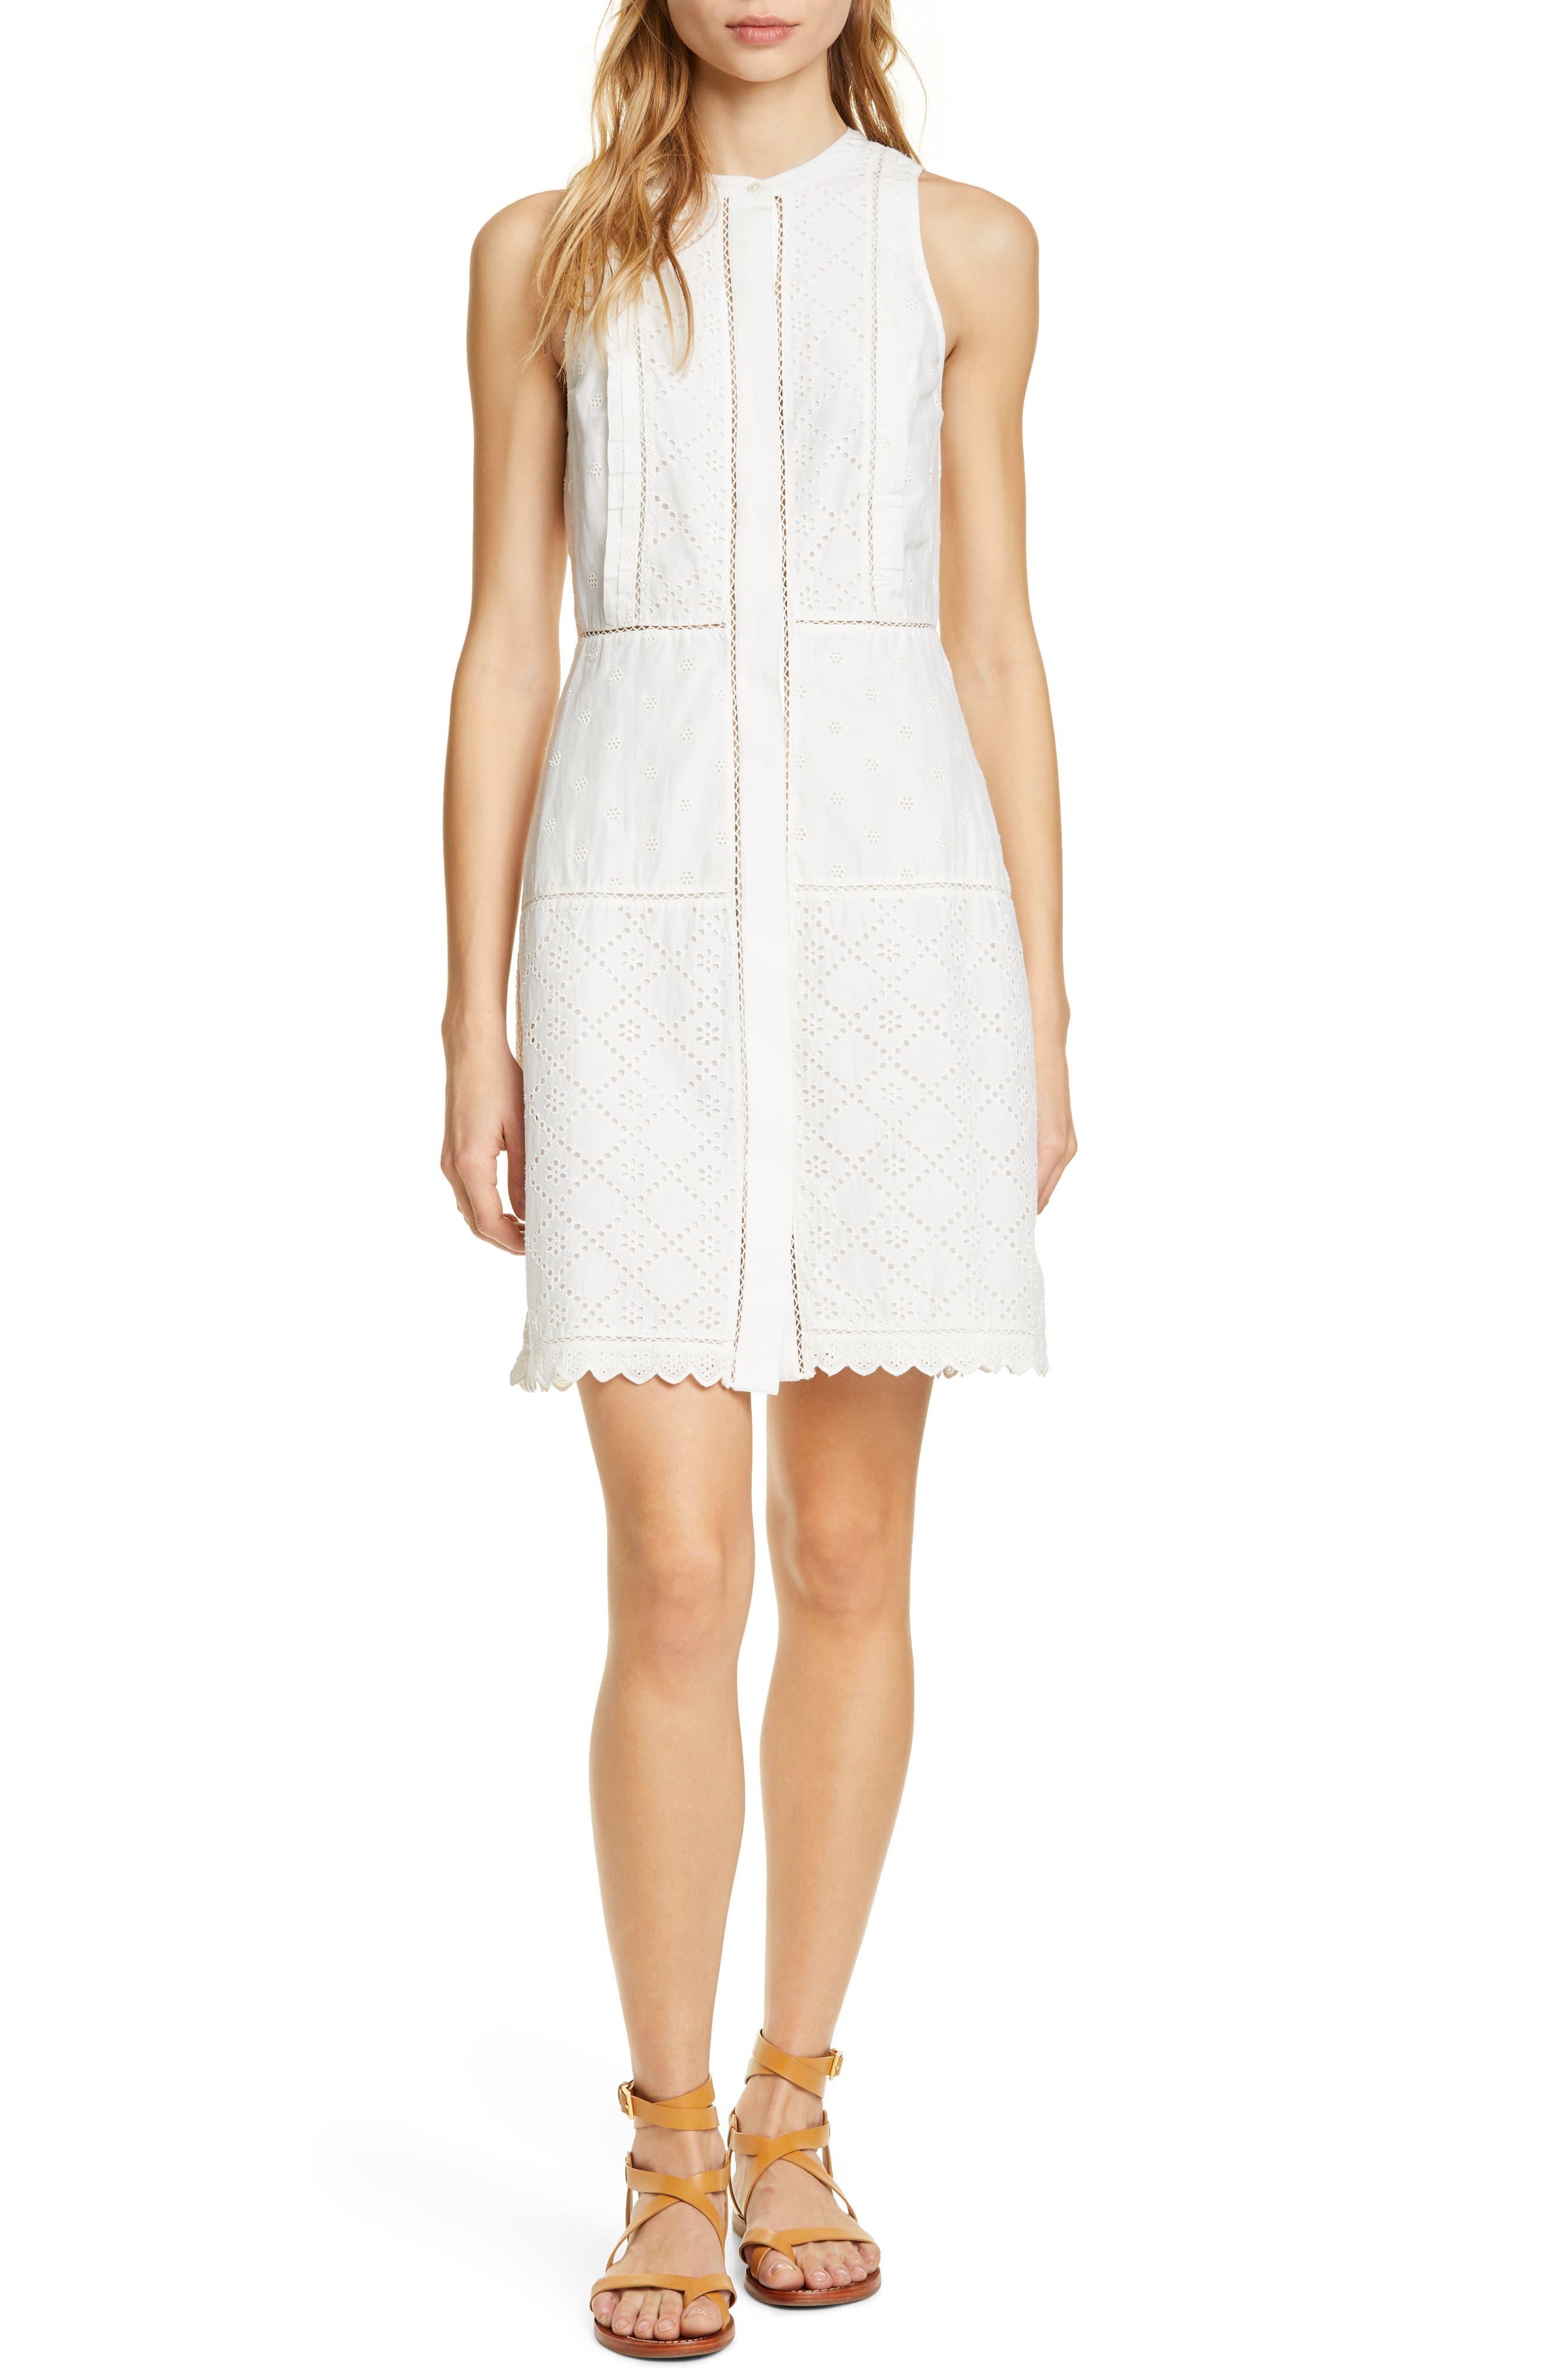 Joie Zakari Eyelet Detail Cotton & Silk Sleeveless Dress, Ivory